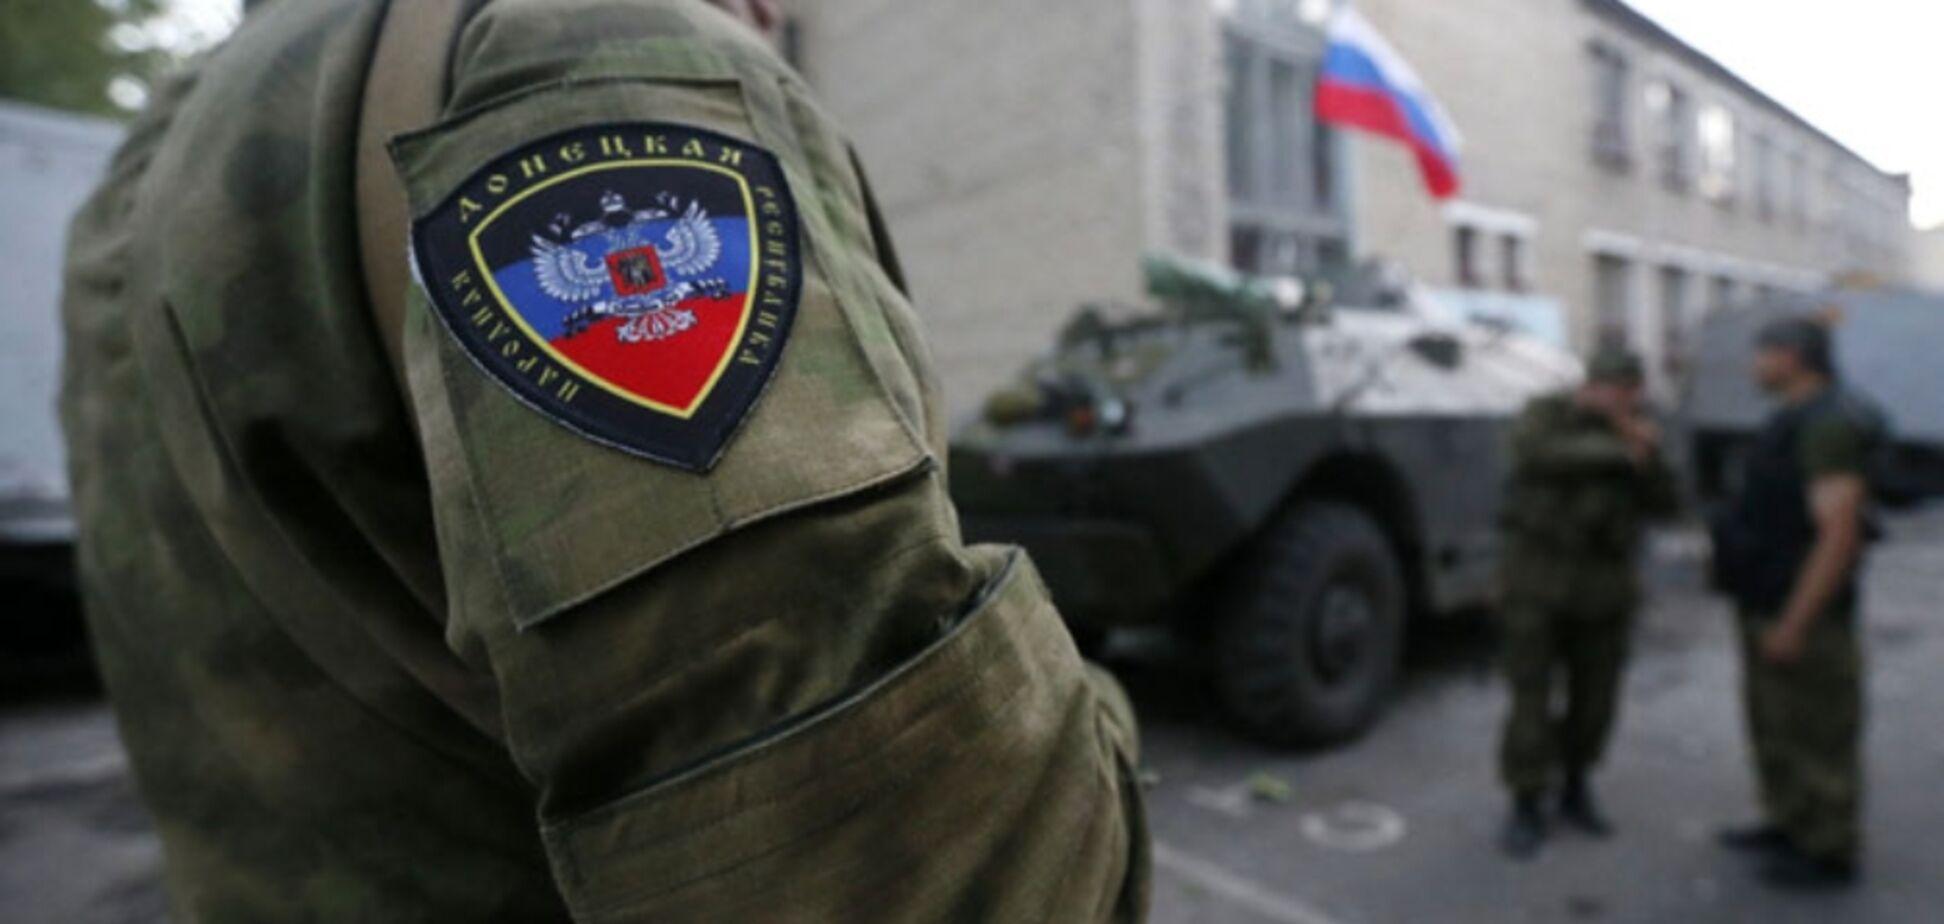 'Фашизм напав': в Україні пояснили, як Росія захопила Донбас